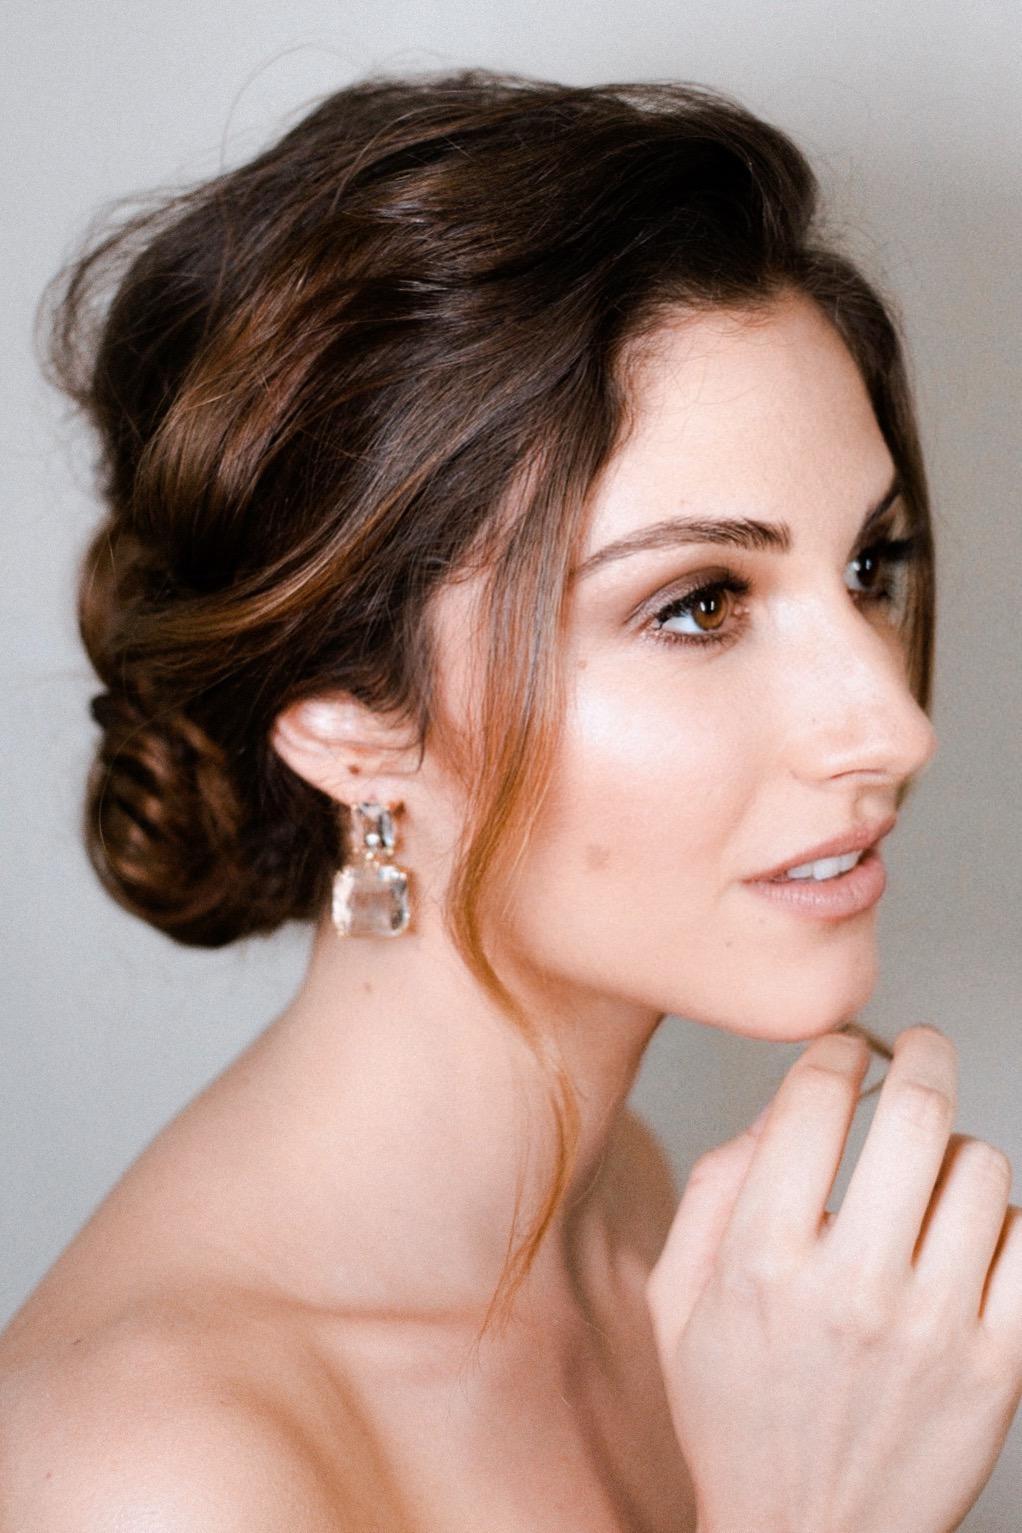 hair and makeup by alexia bigaud morin